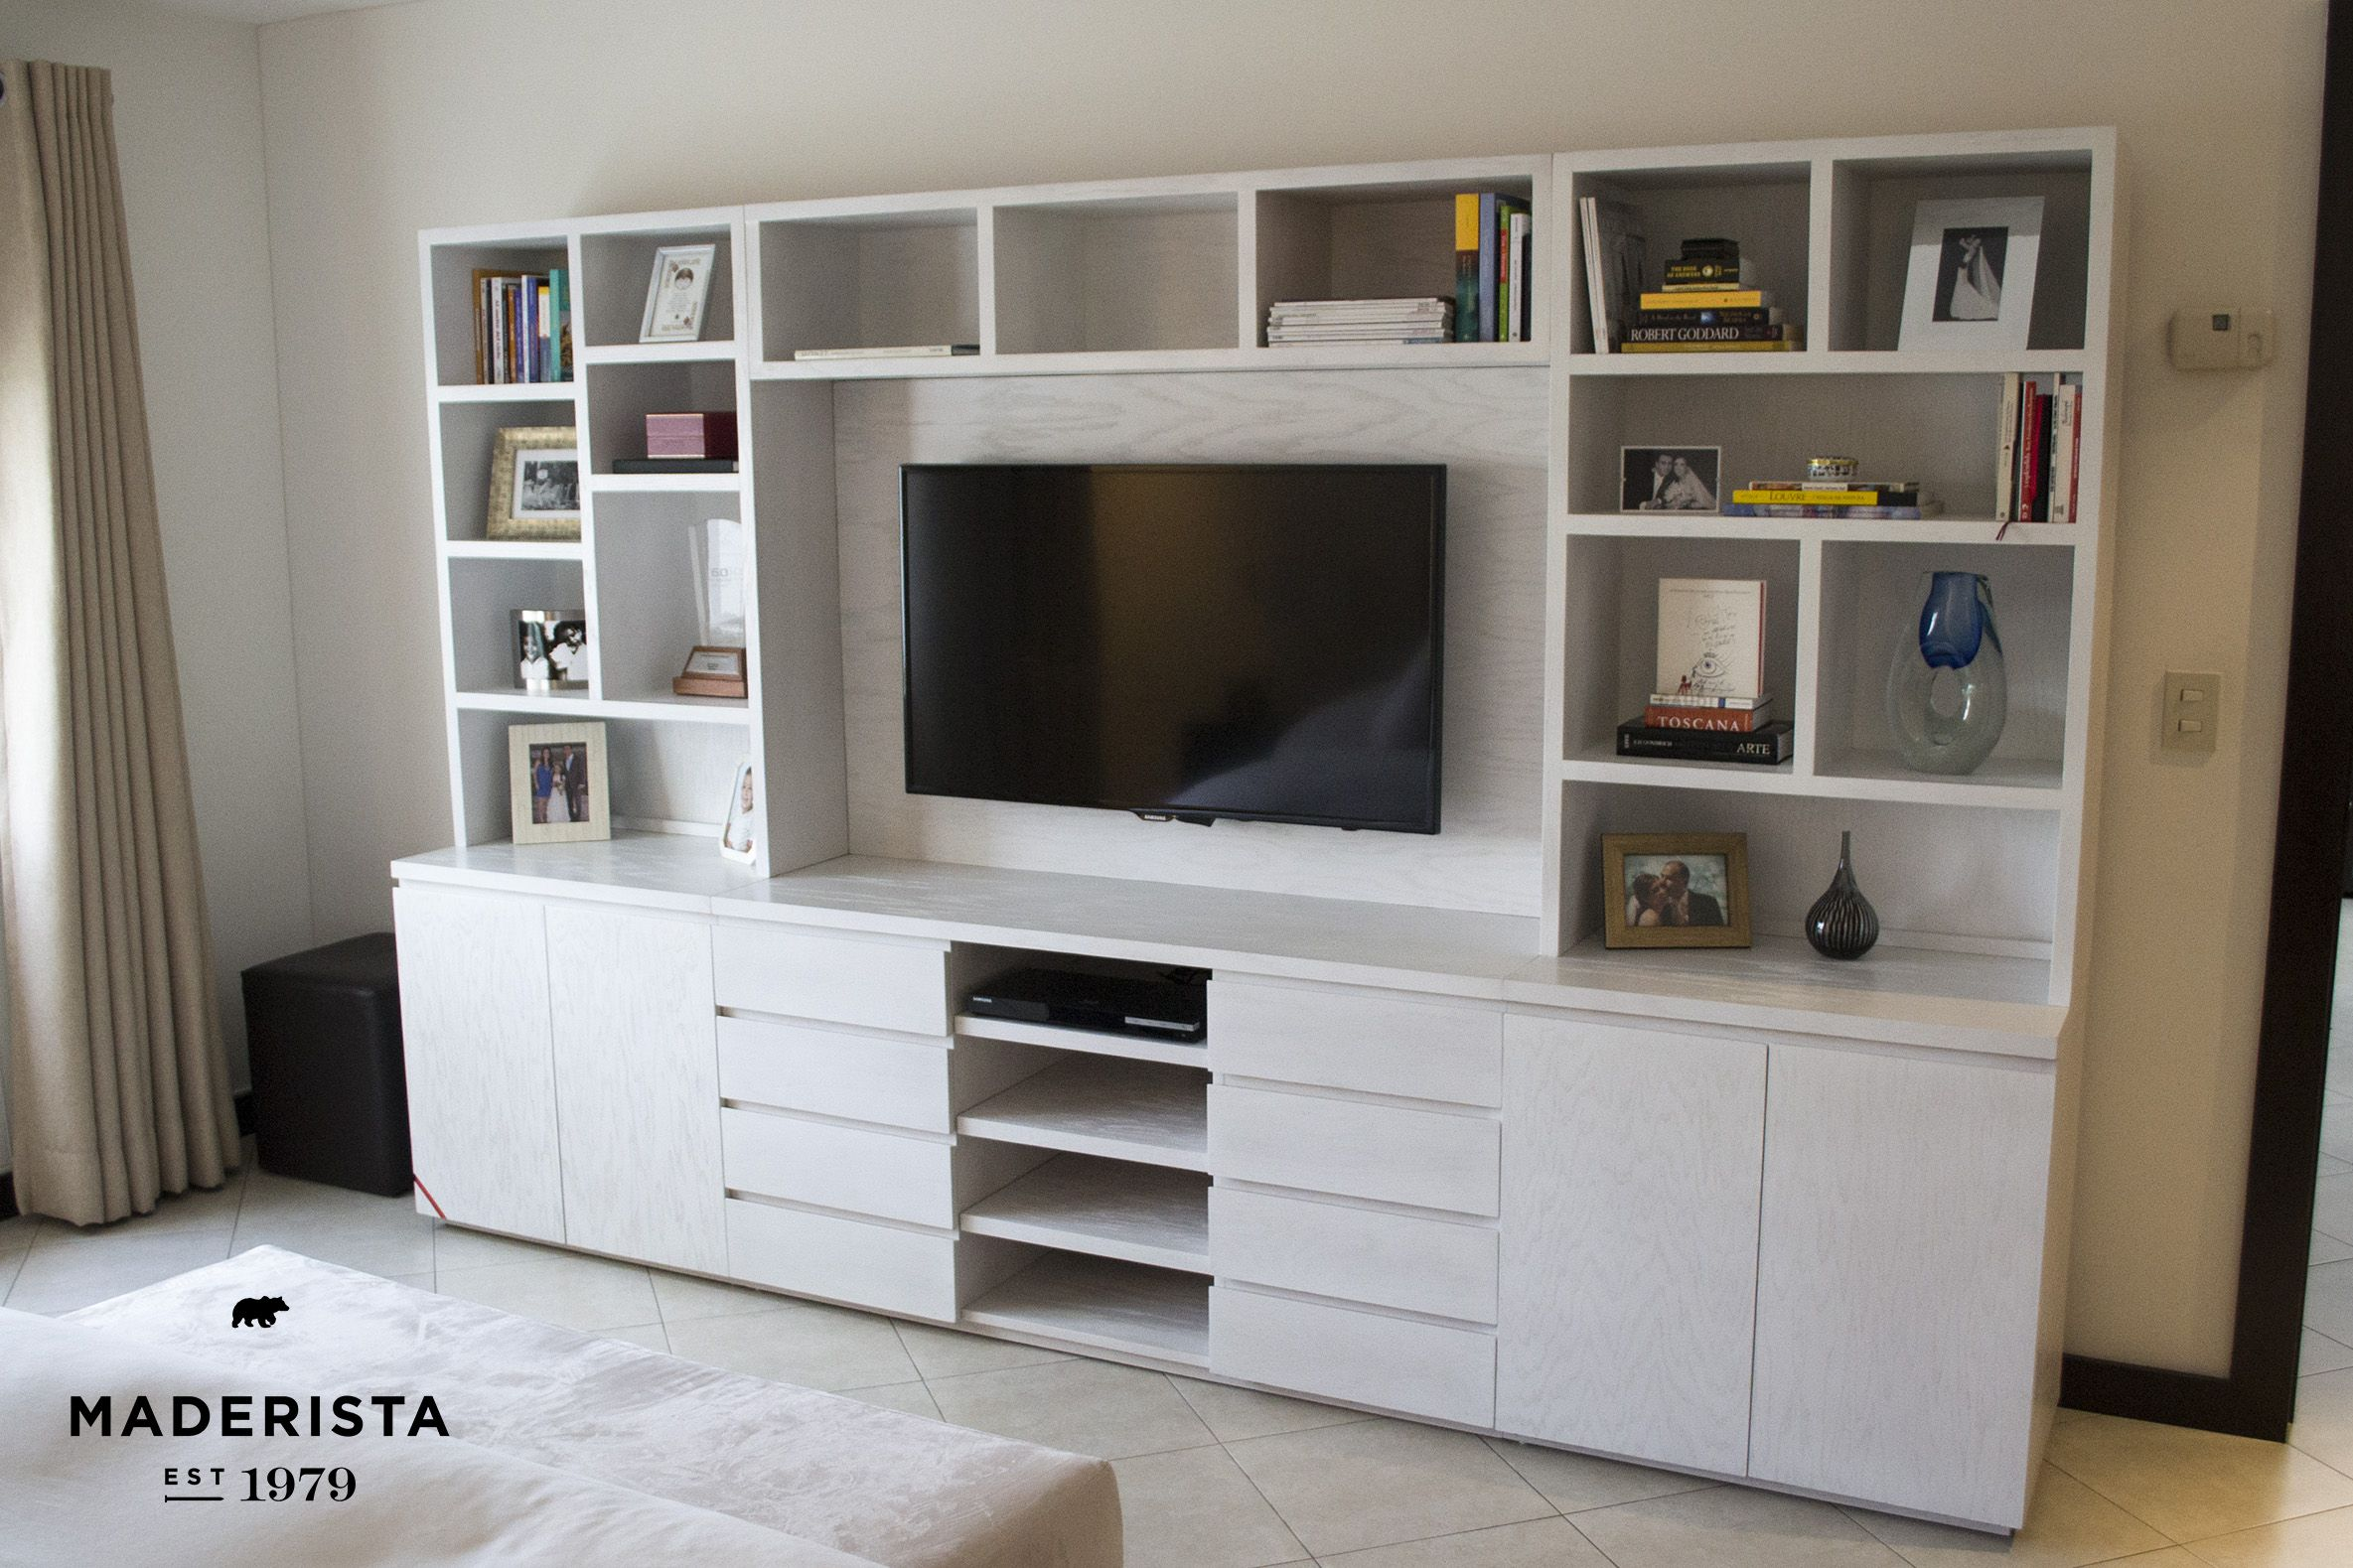 Mueble De Tv Para Recamara By Maderista Muebles By Maderista  # Muebles Suspendidos Para Tv